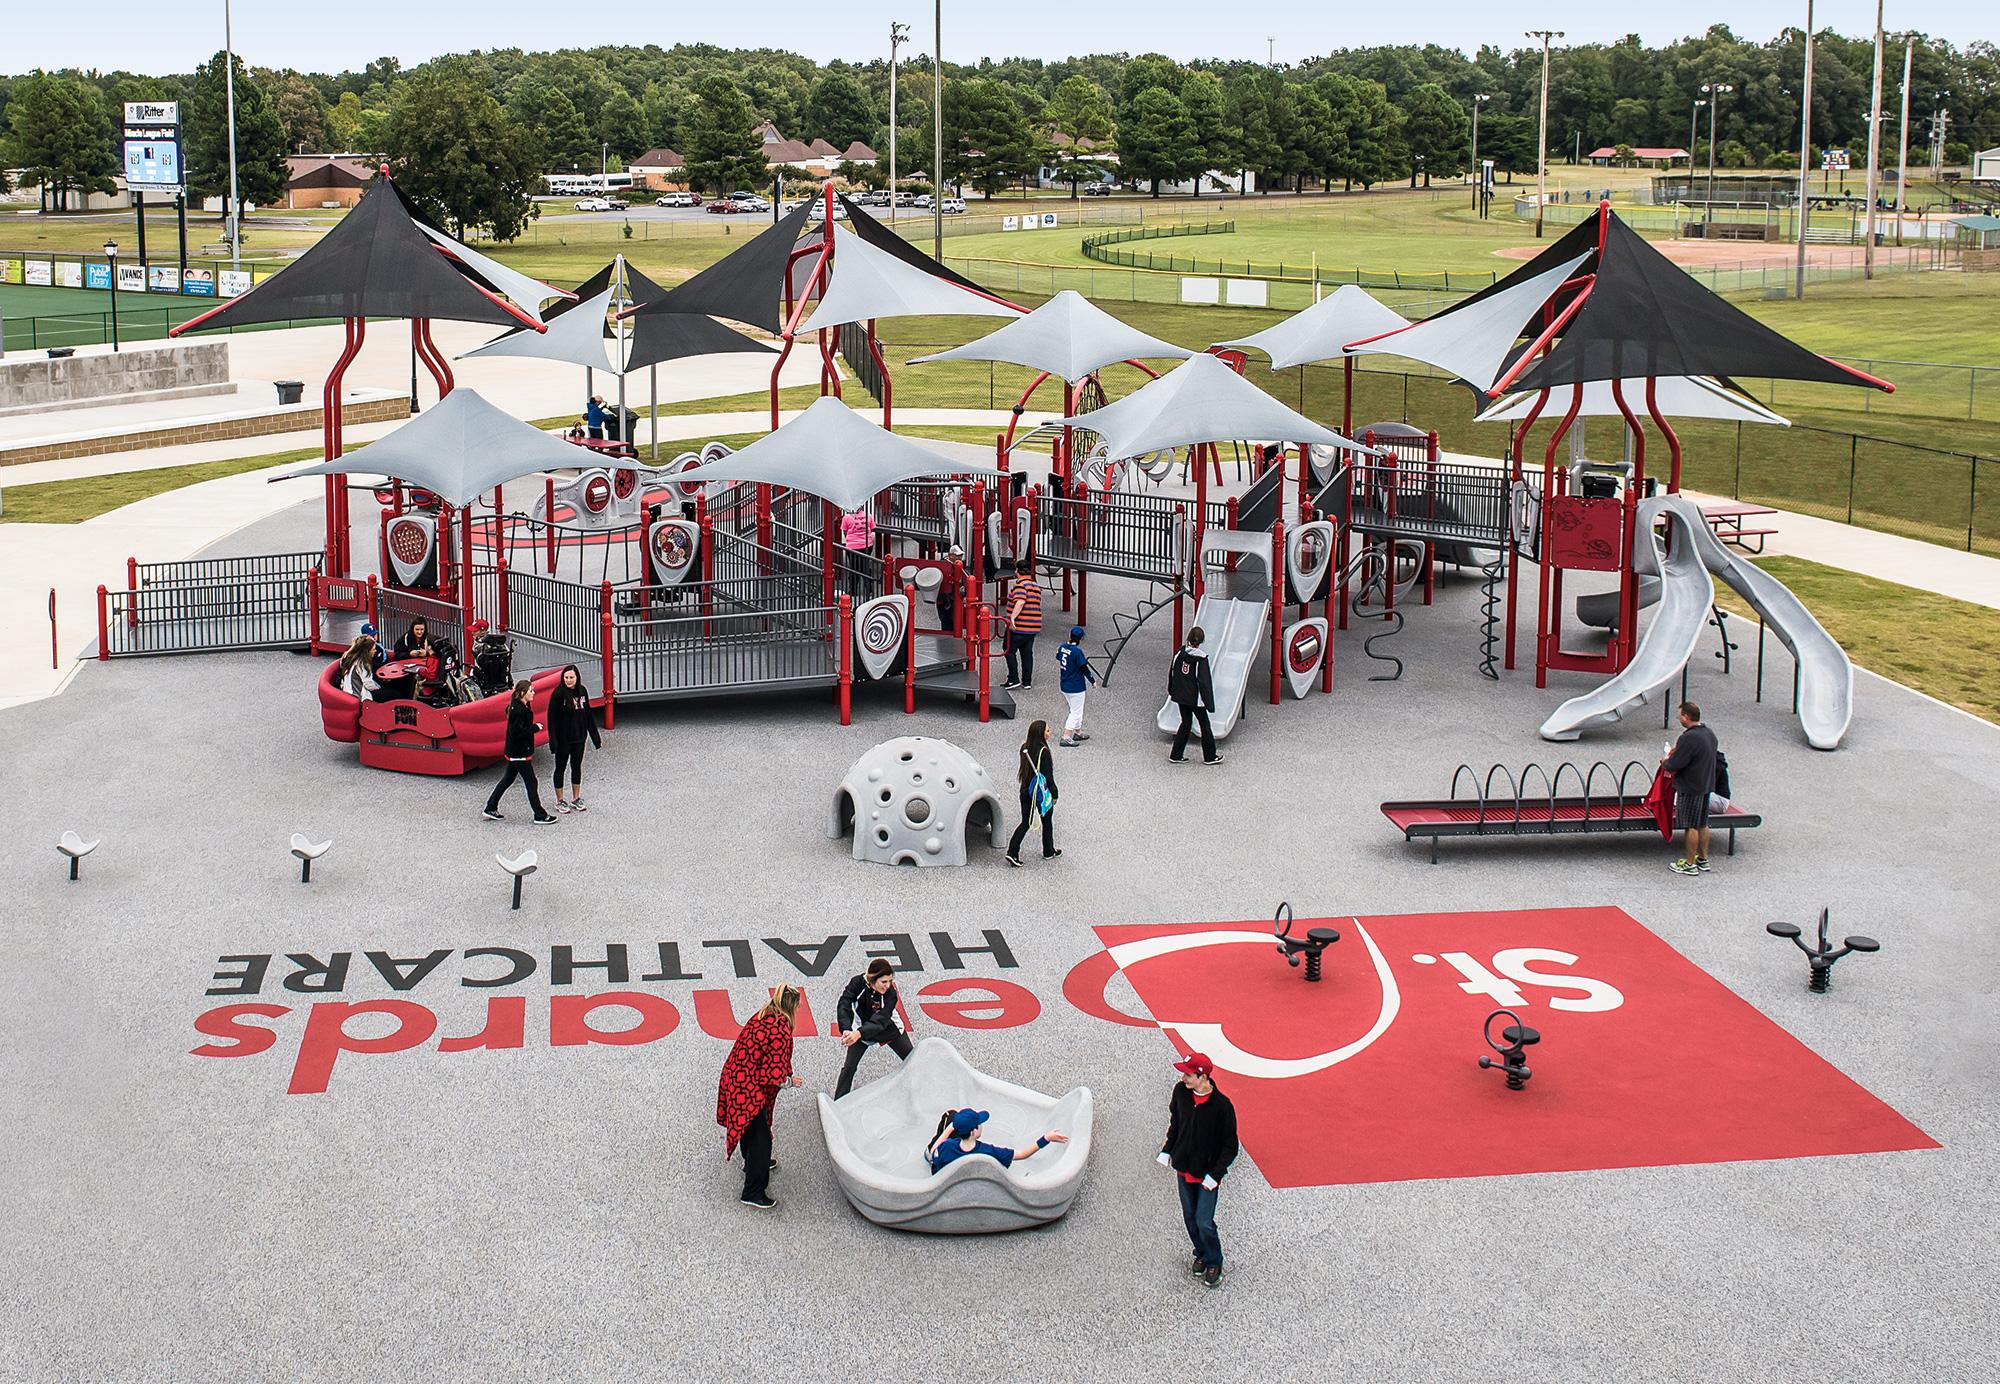 Playground Equipment Products